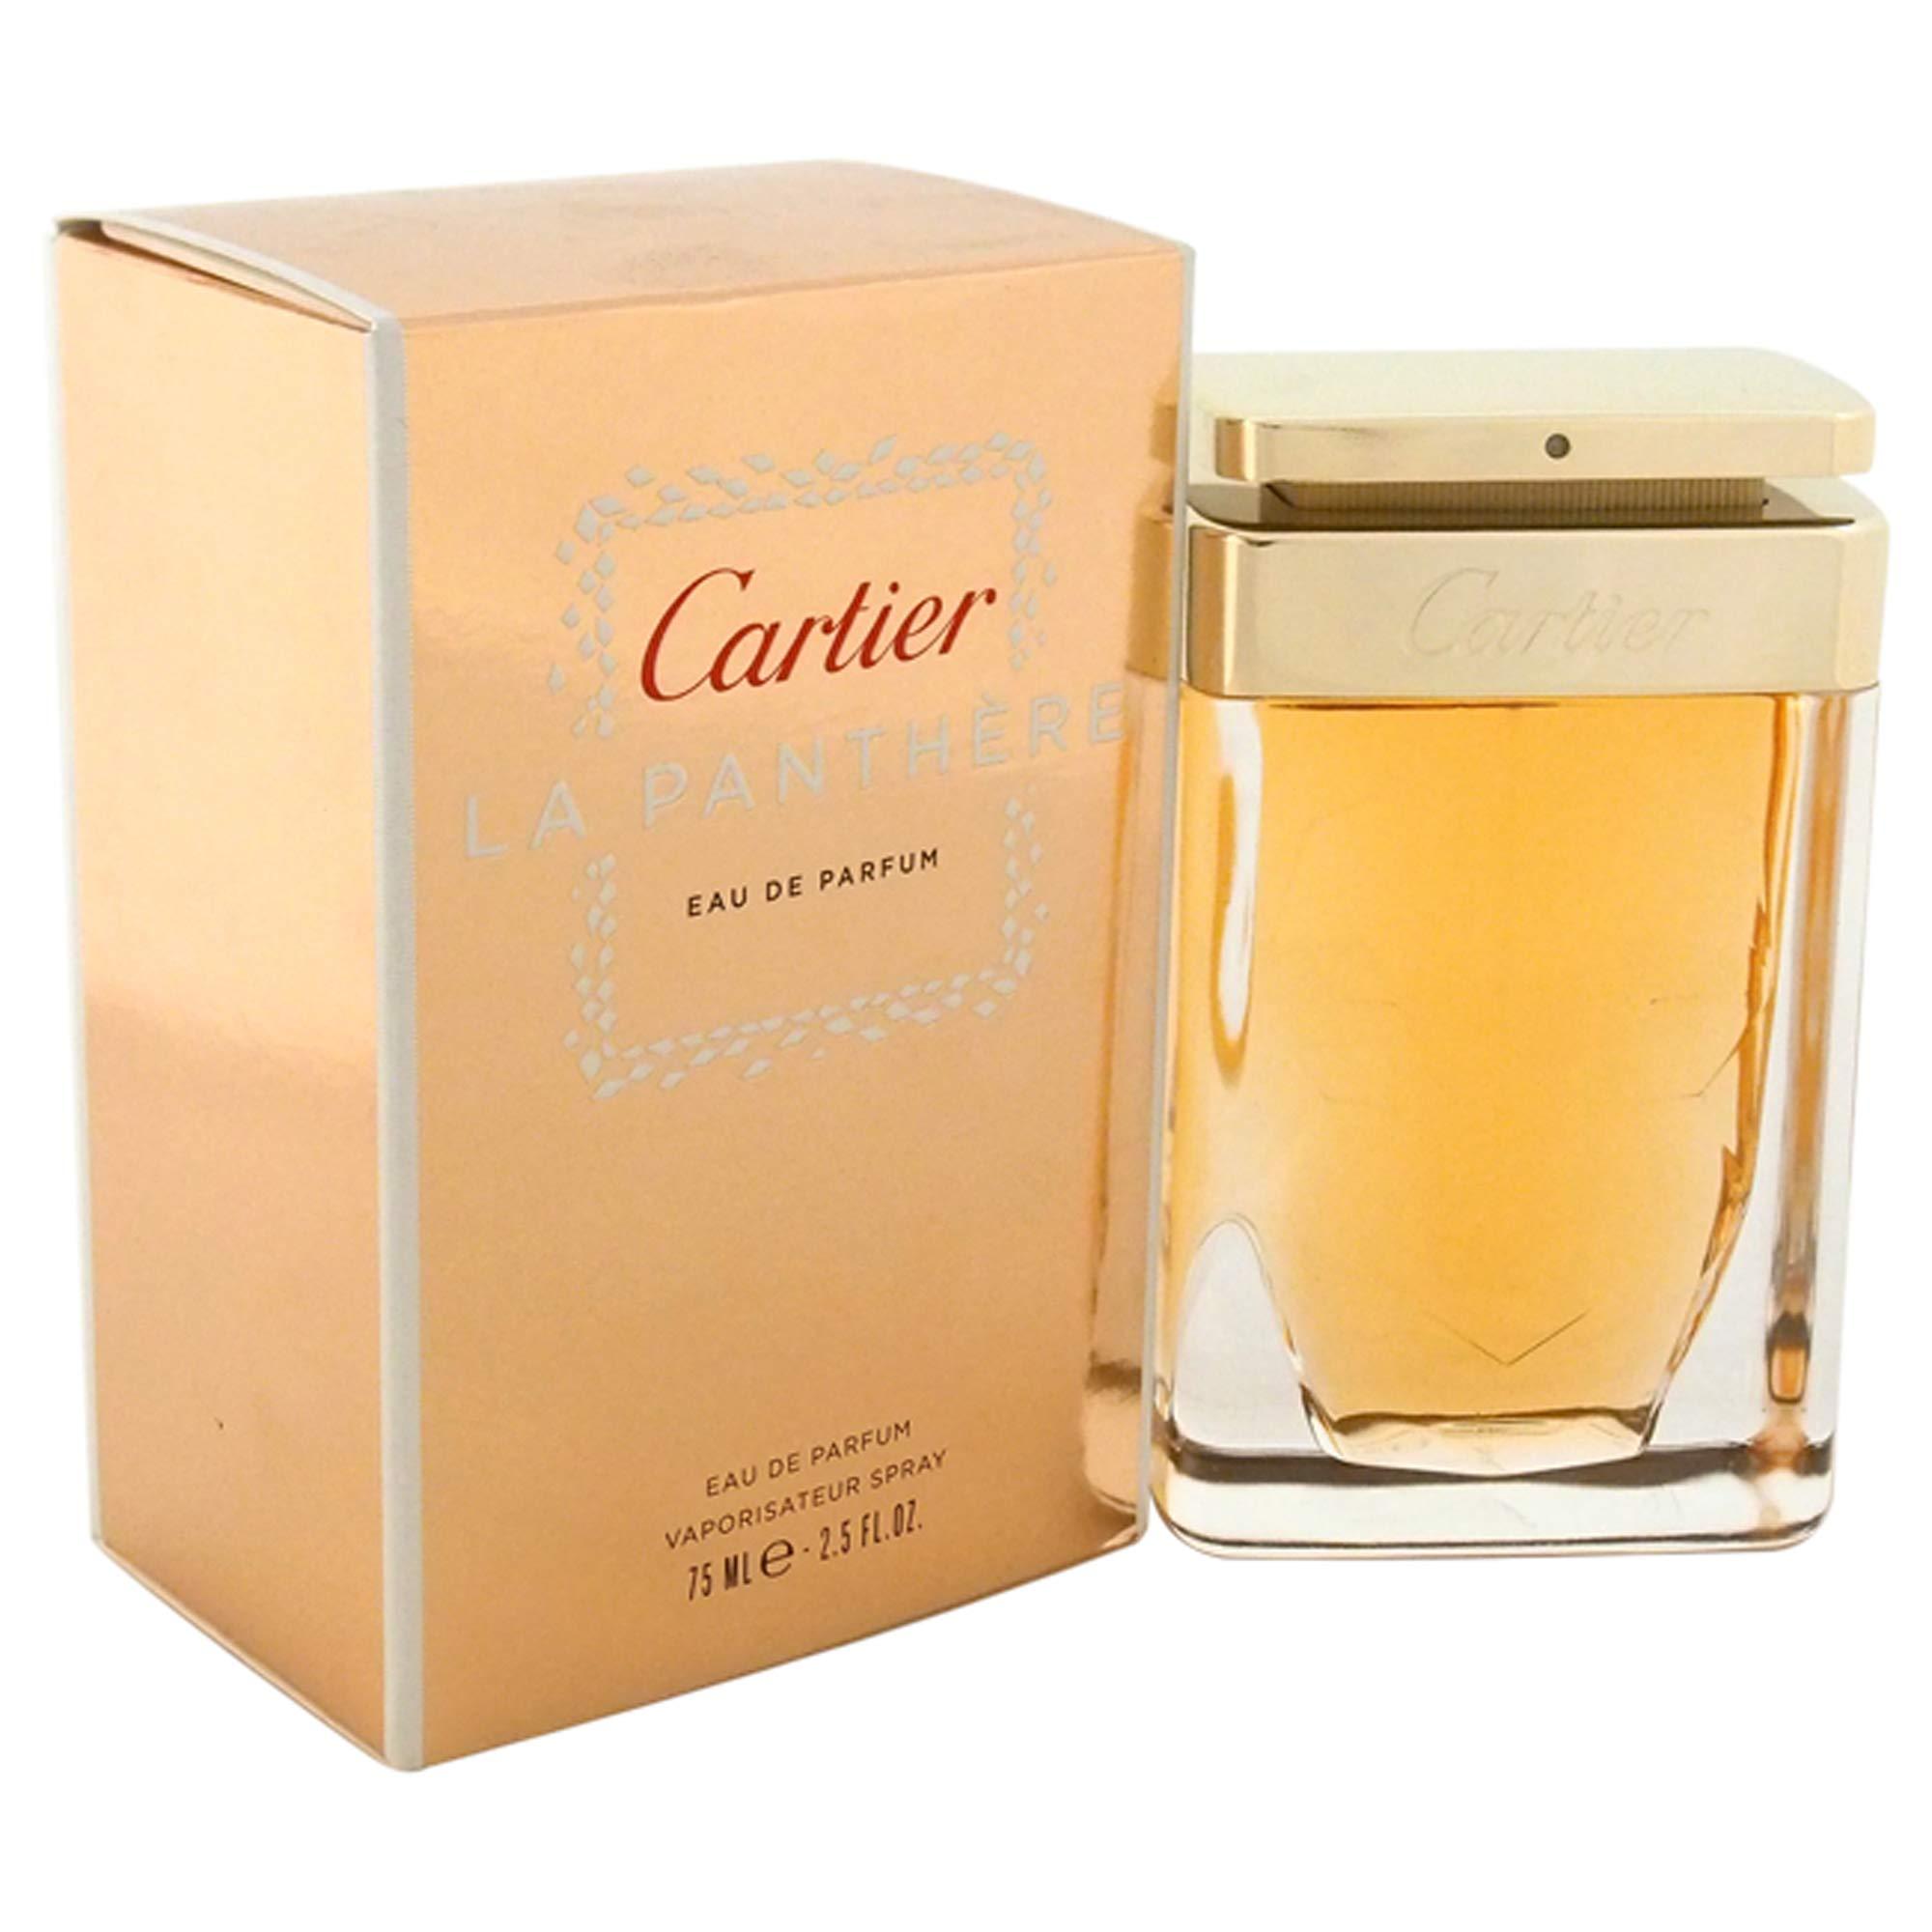 Cartier Panthere Eau Parfum Spray